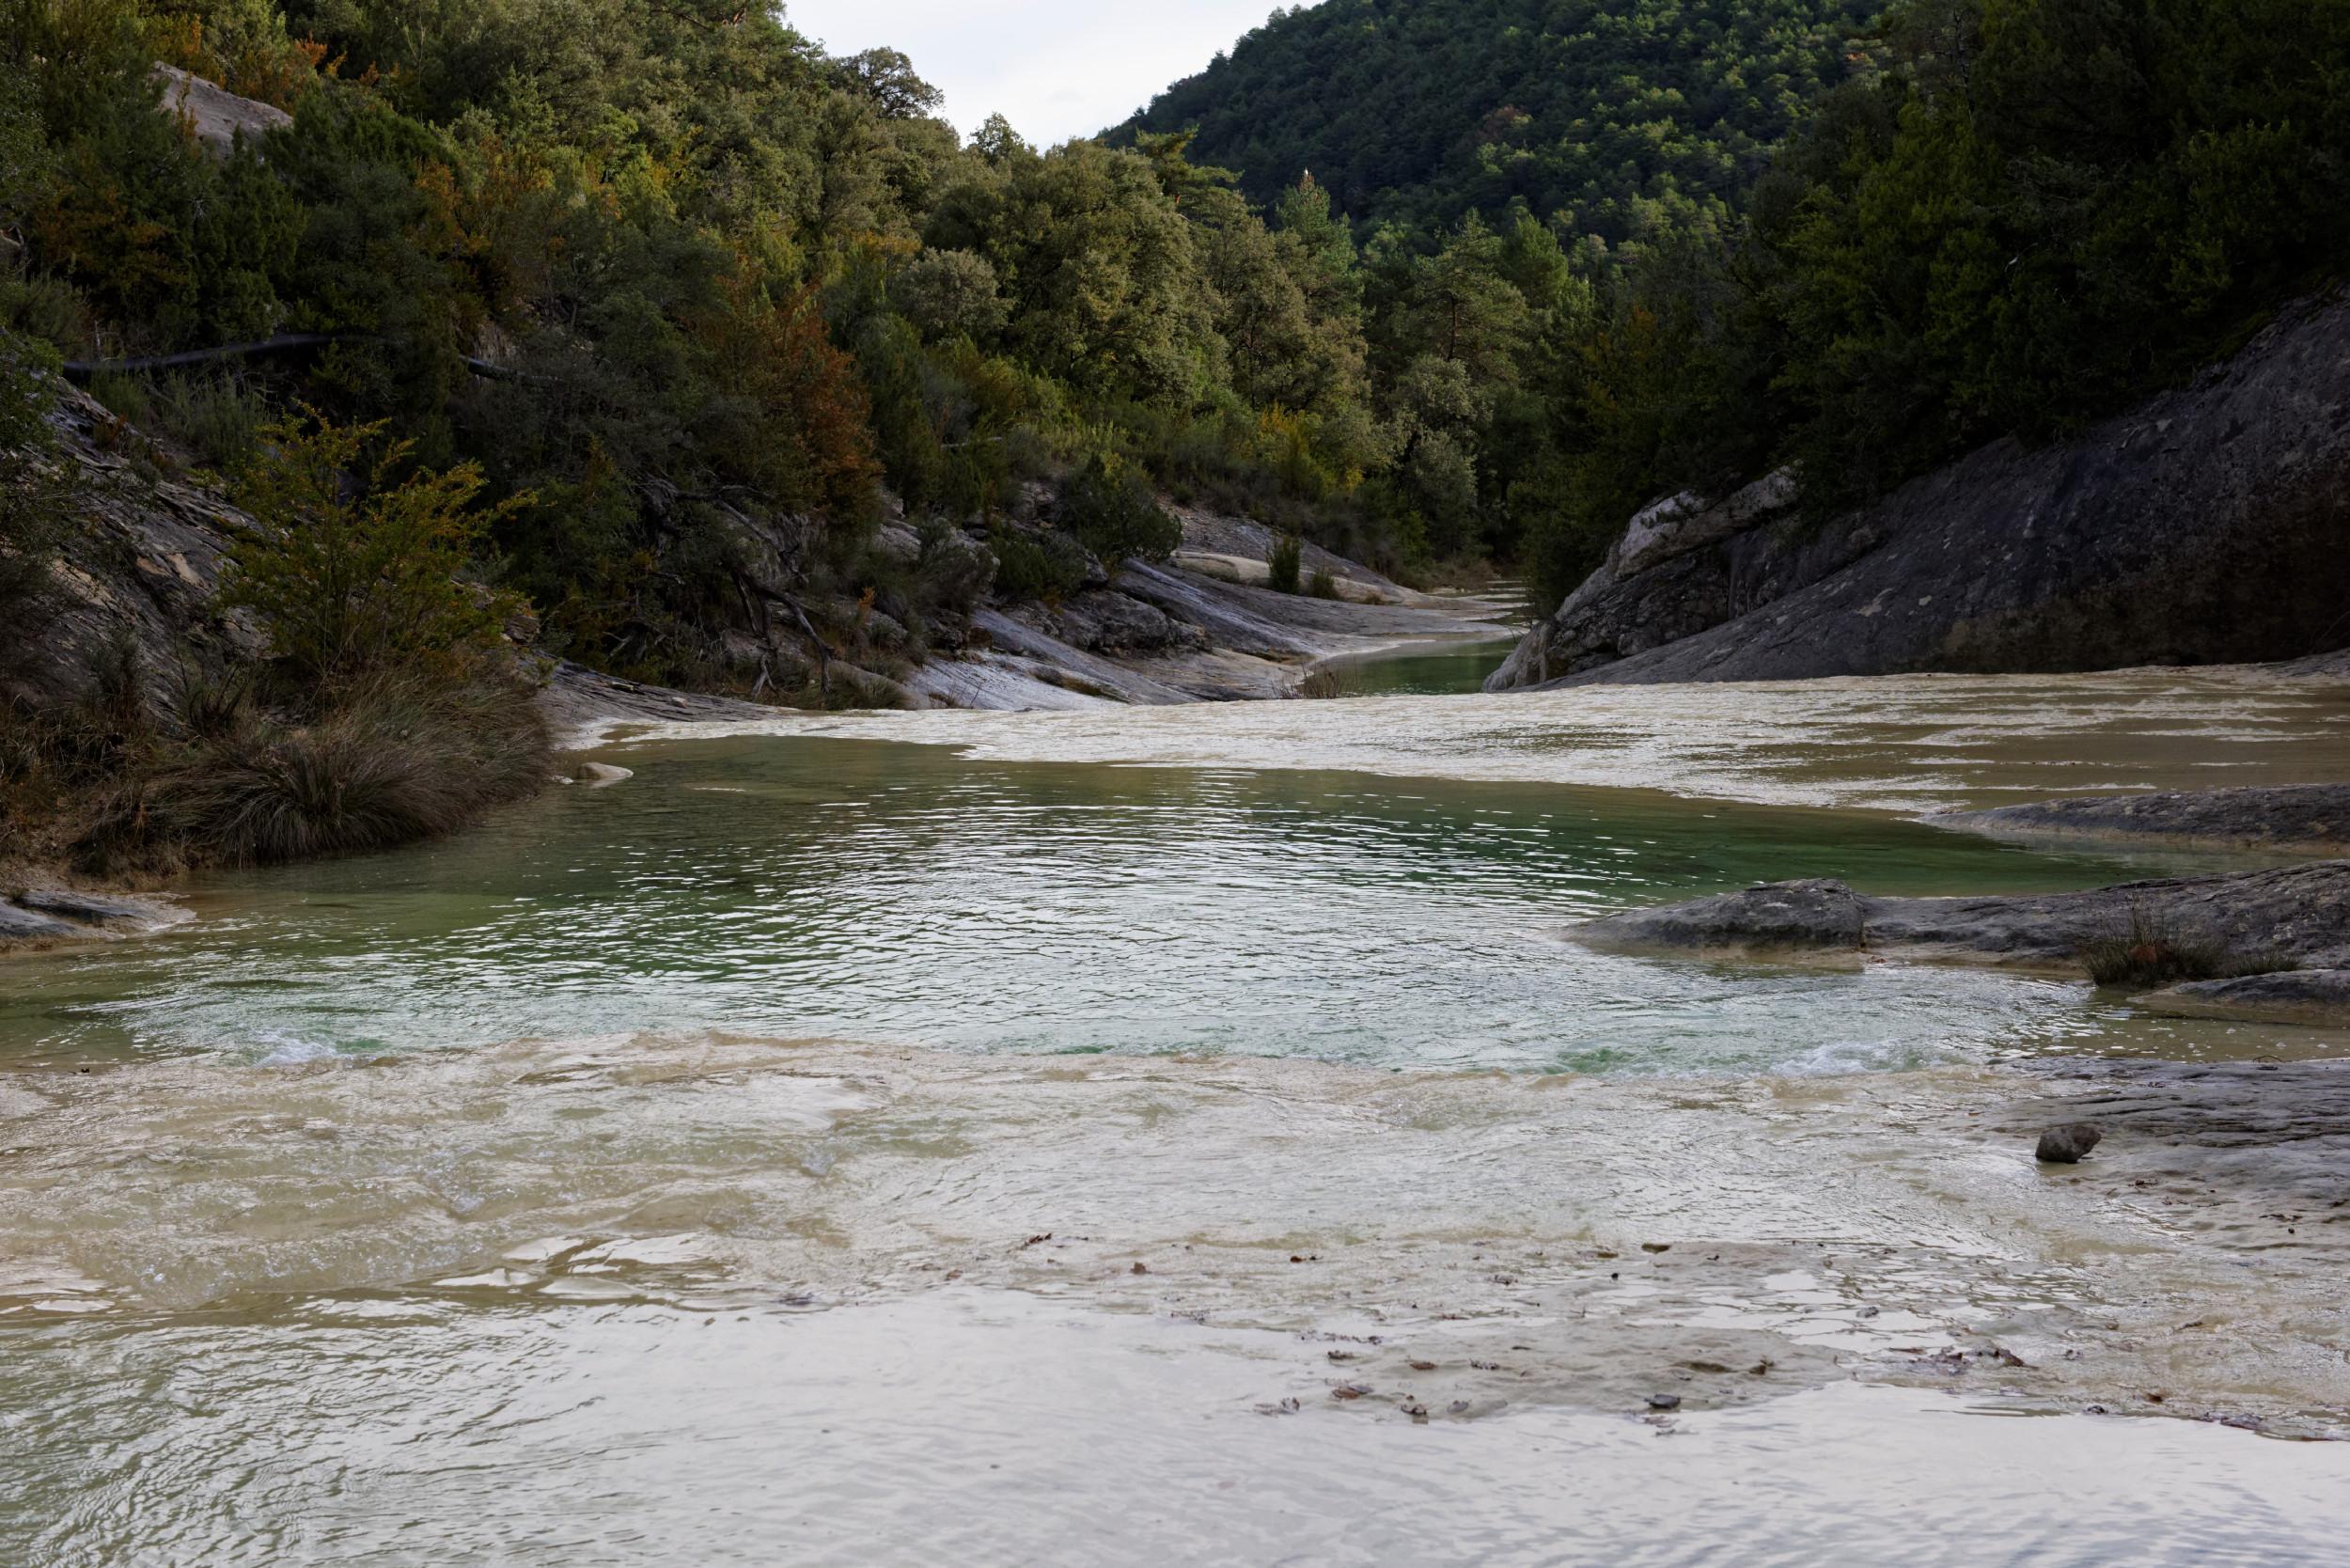 141208-Sieste - Canyon et Barranco (Sobrarbe) (29)